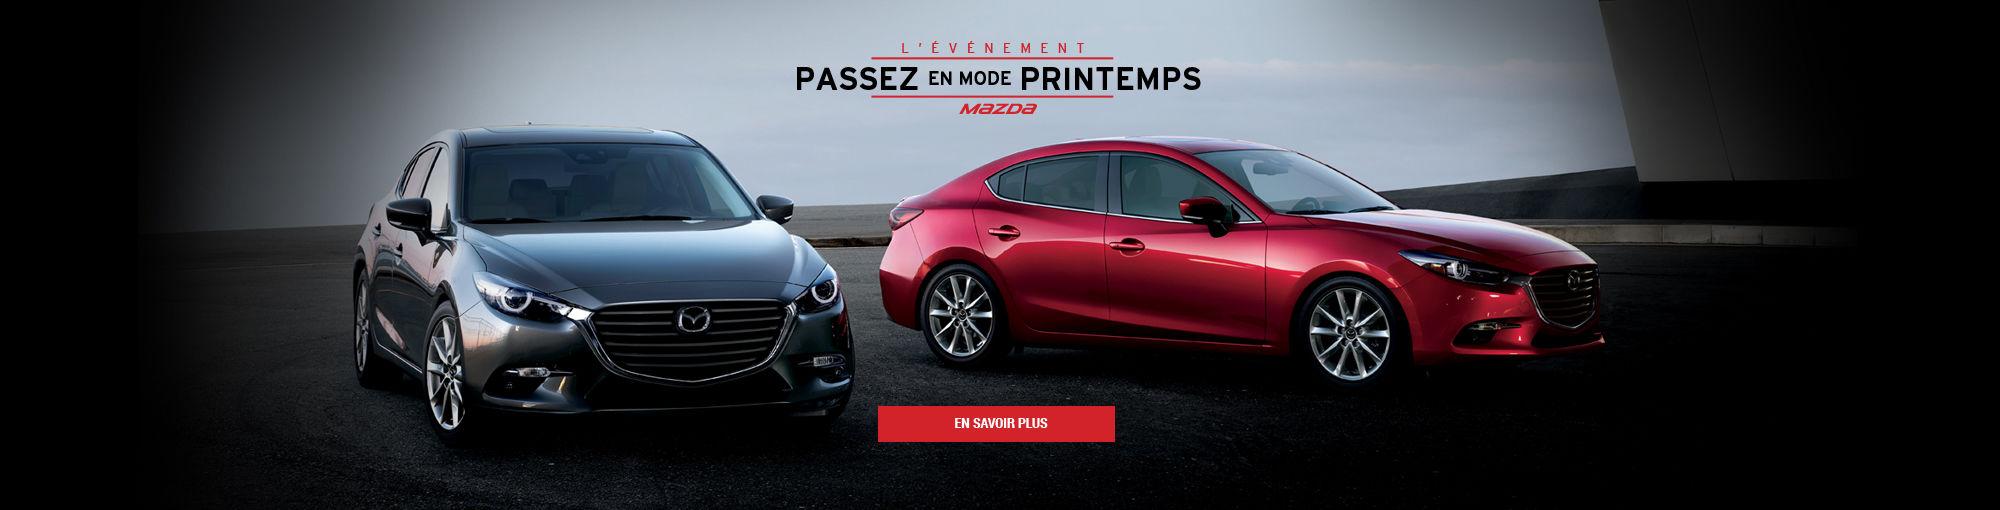 Mazda header mars 2018 passez en mode printemps